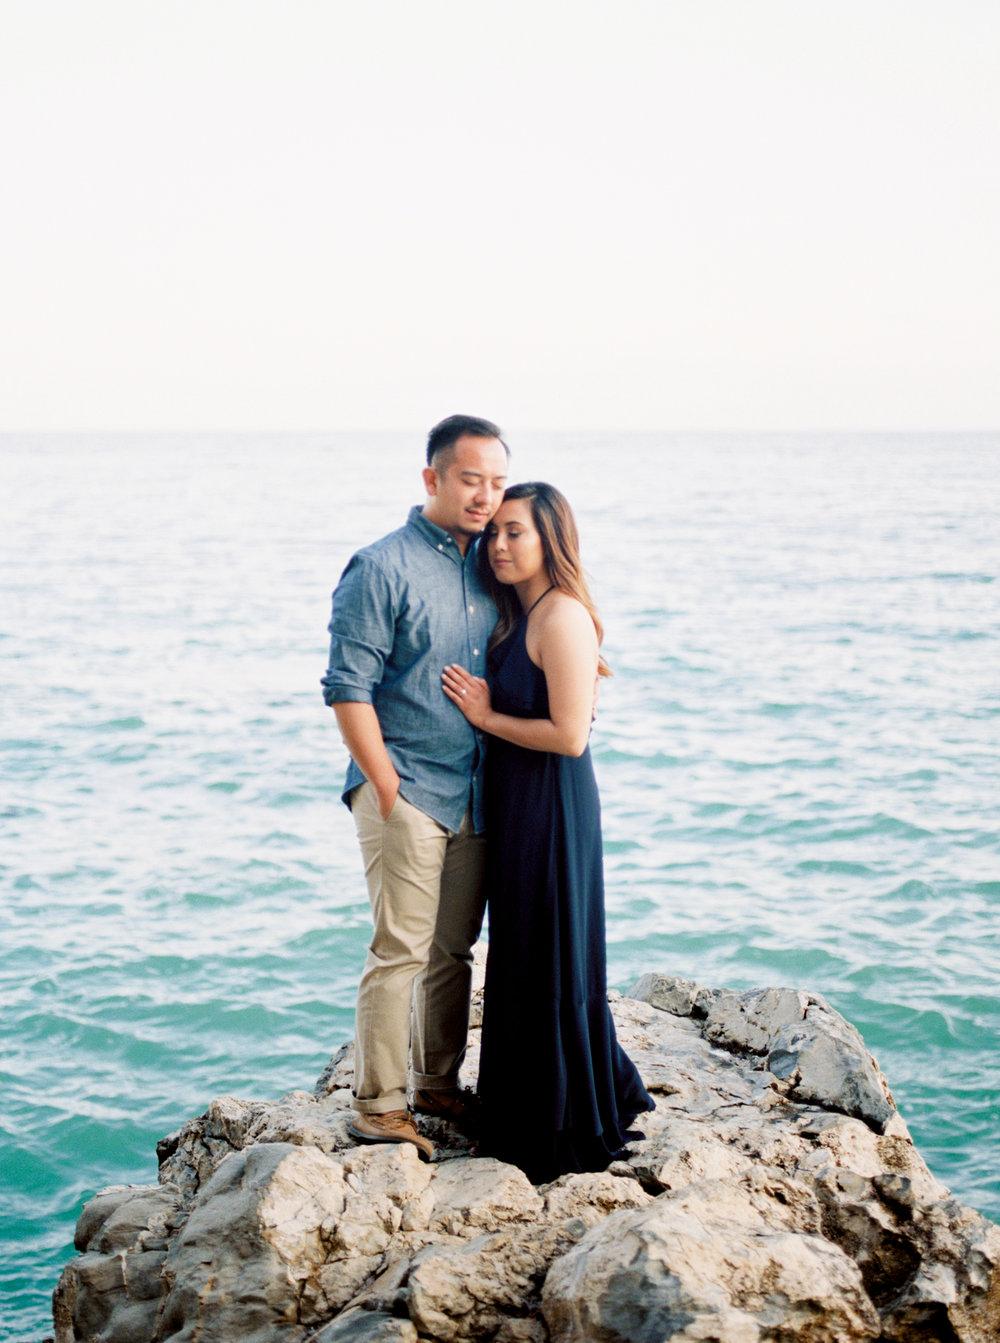 Krystel & Richard | Rancho Palos Verdes Engagement